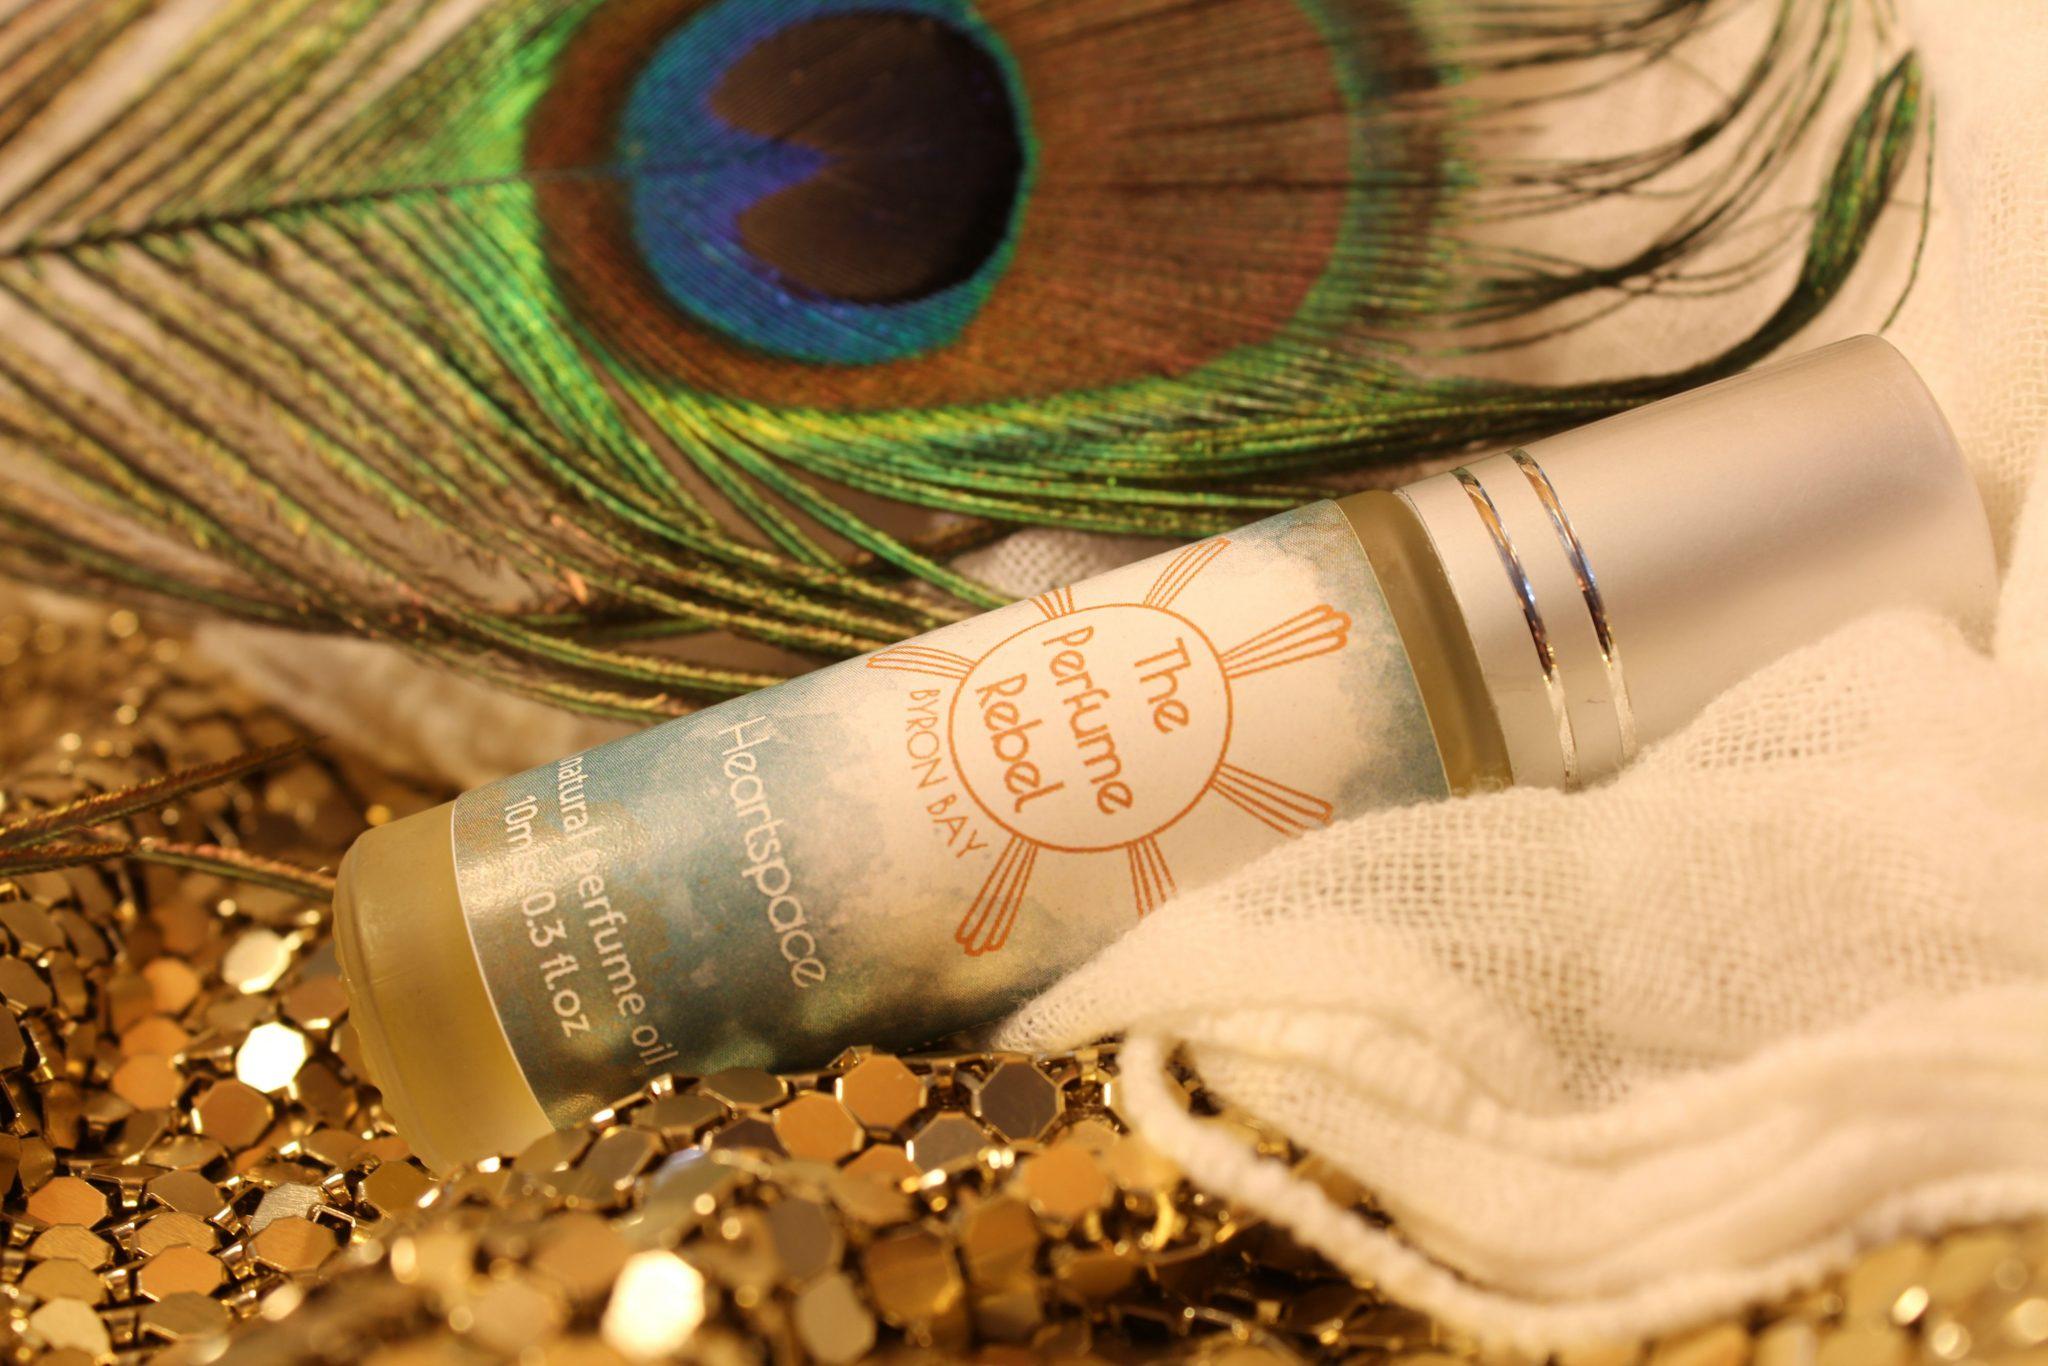 Natural Perfume - Heartspace